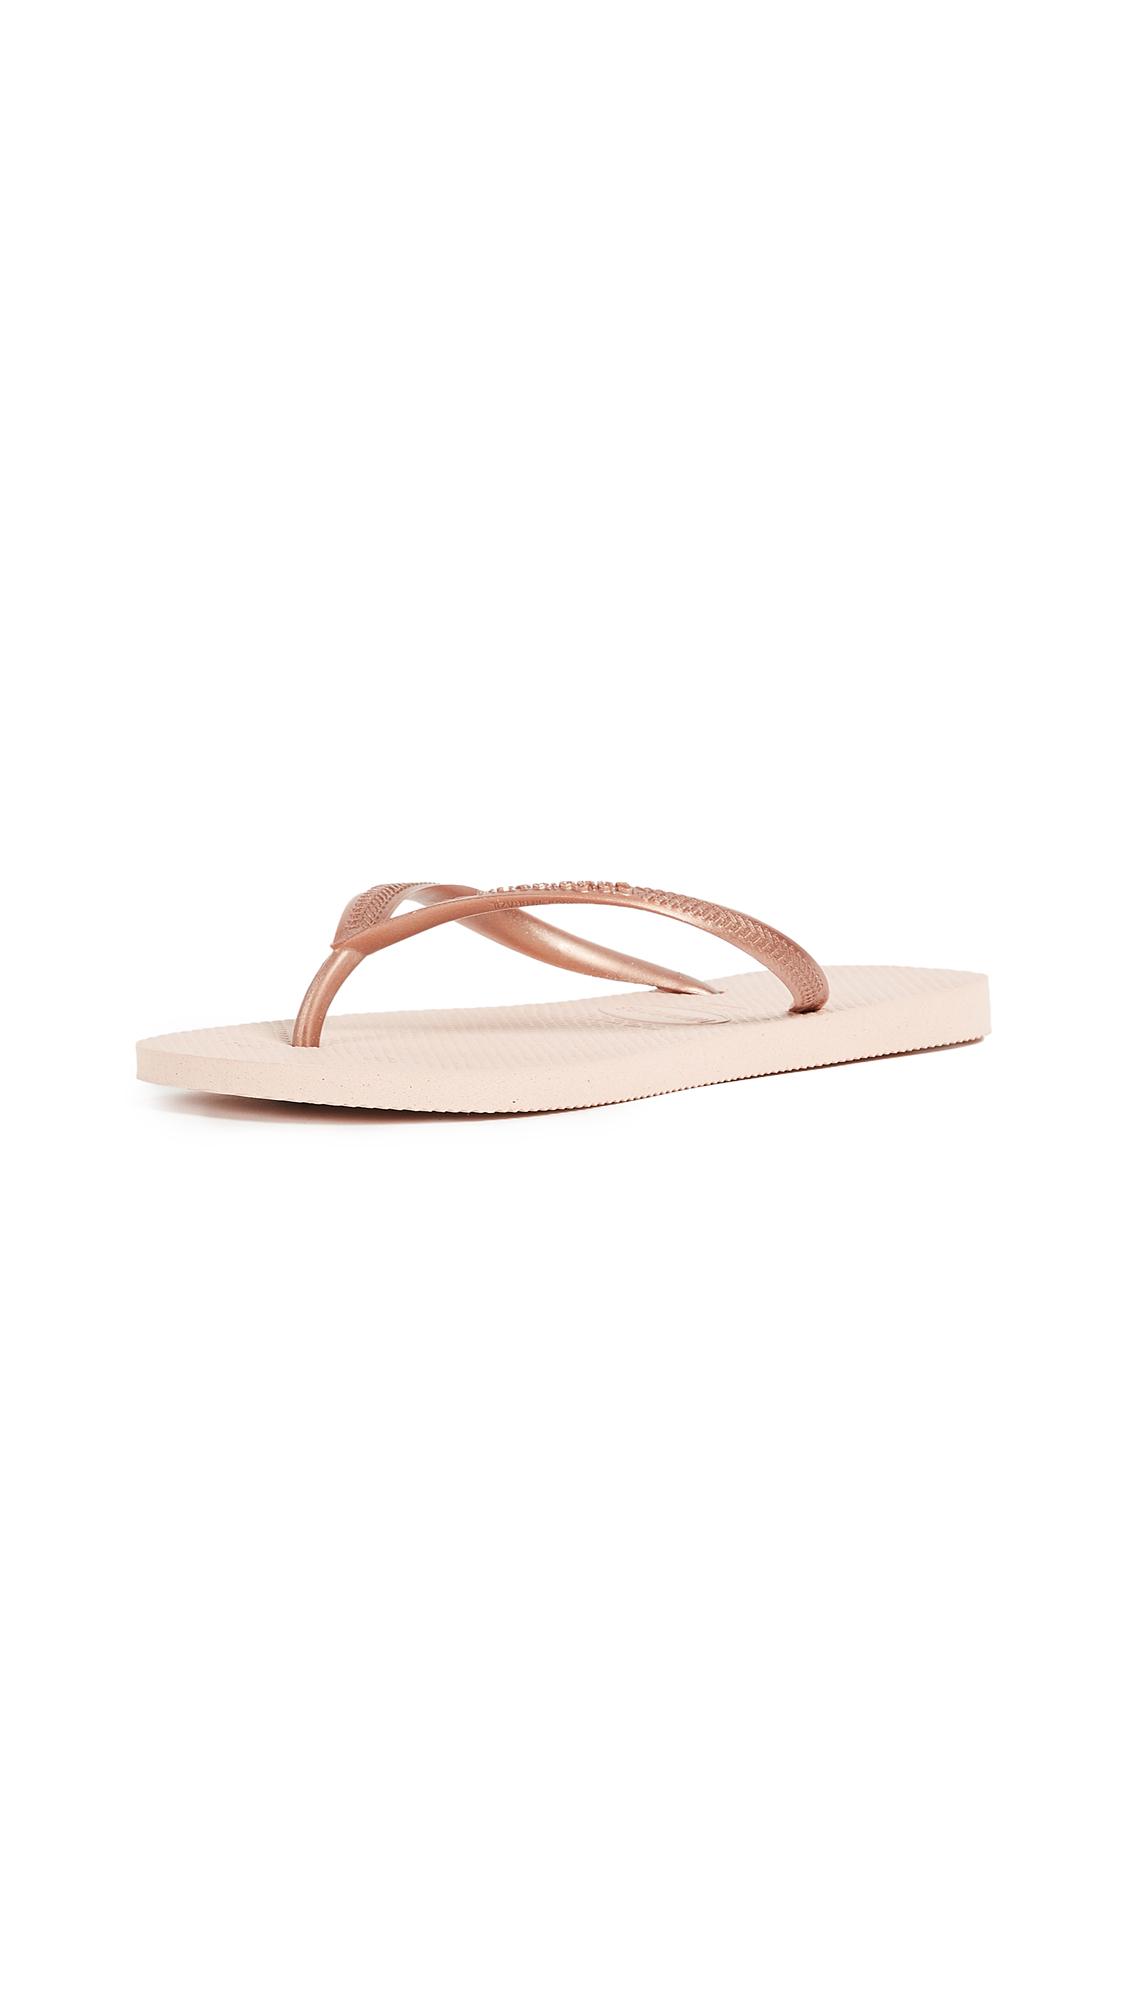 Havaianas Slim Flip Flops - Ballet Rose